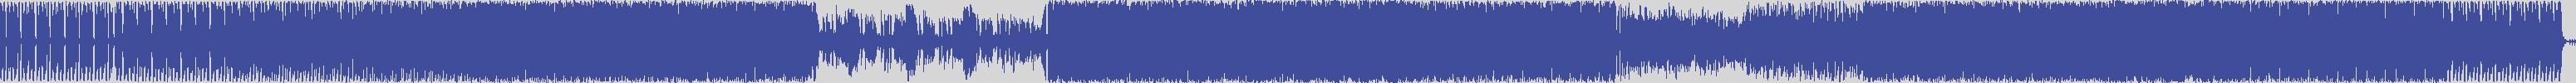 just_digital_records [JS1143] Homeboyz - Future [Dark Mix] audio wave form